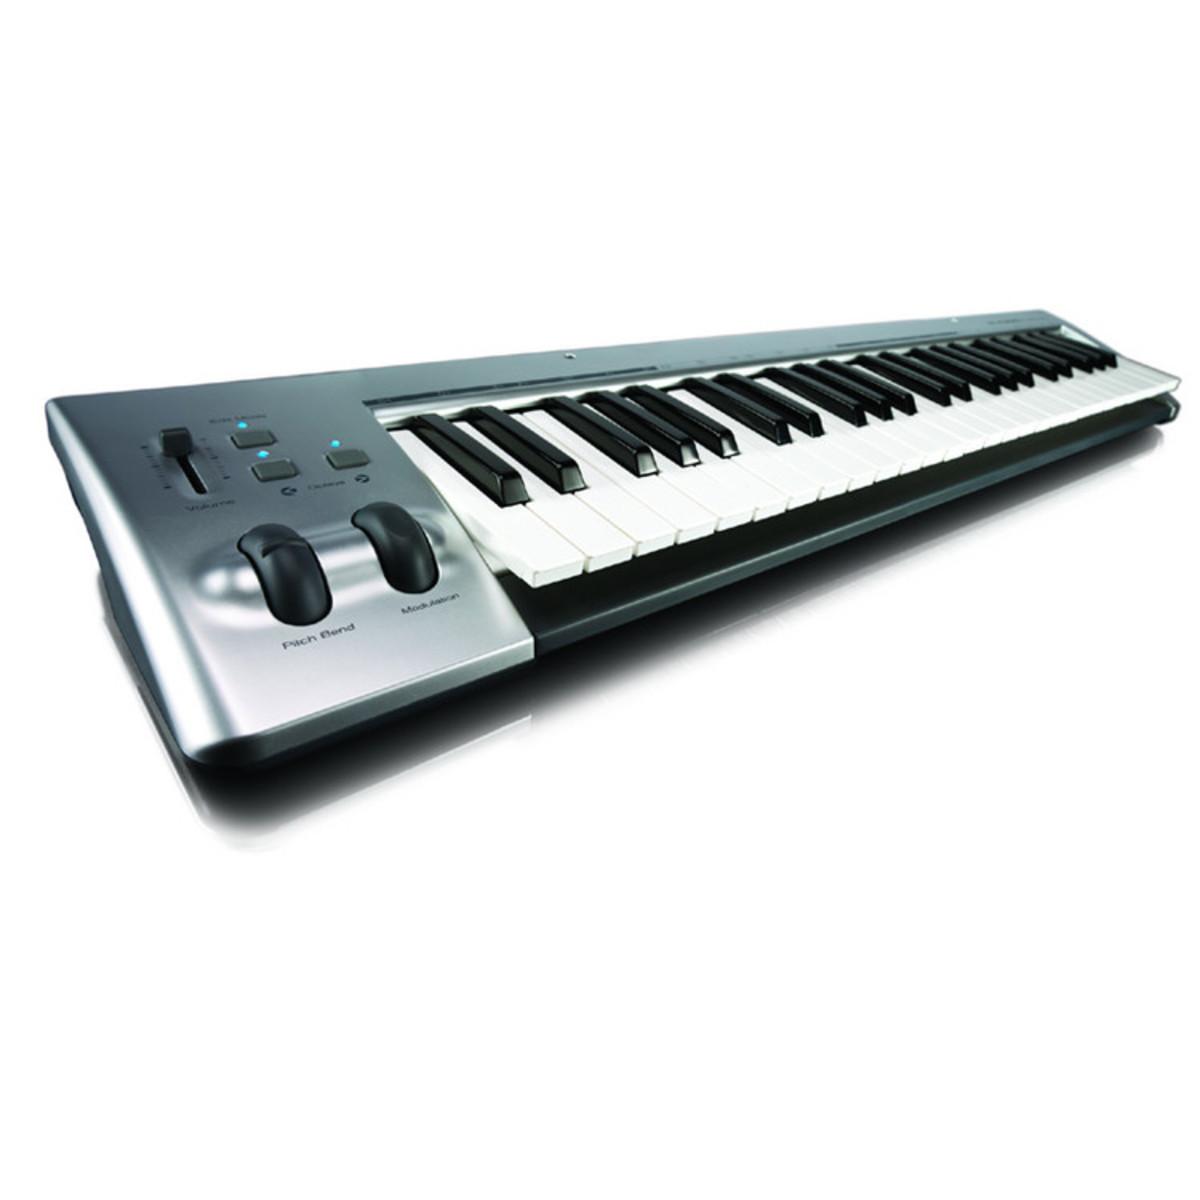 puis m audio keystudio 49 usb midi clavier. Black Bedroom Furniture Sets. Home Design Ideas